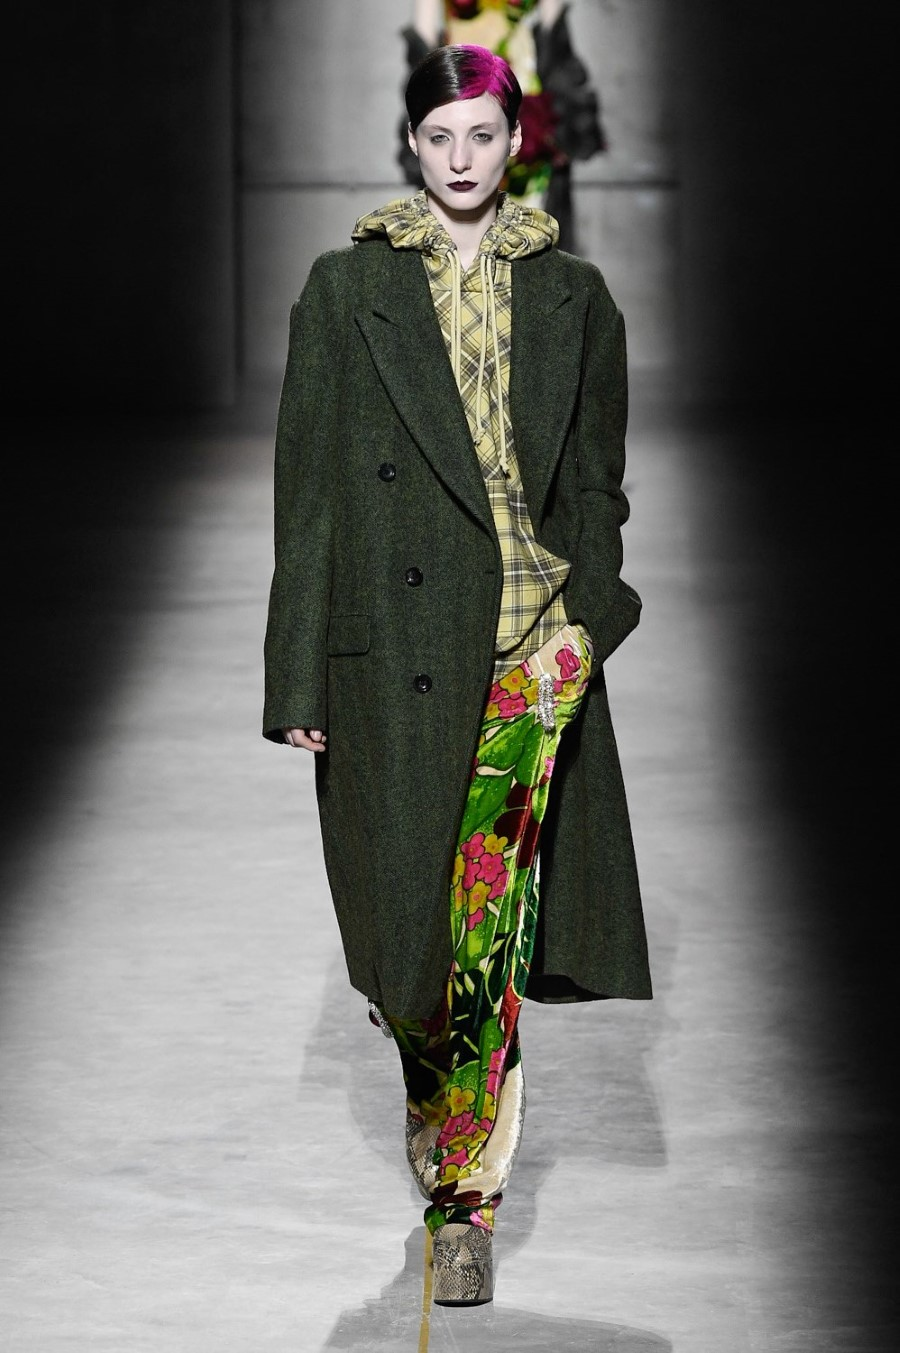 Dries Van Noten - Fall Winter 2020 - Paris Fashion WeekDries Van Noten - Fall Winter 2020 - Paris Fashion Week